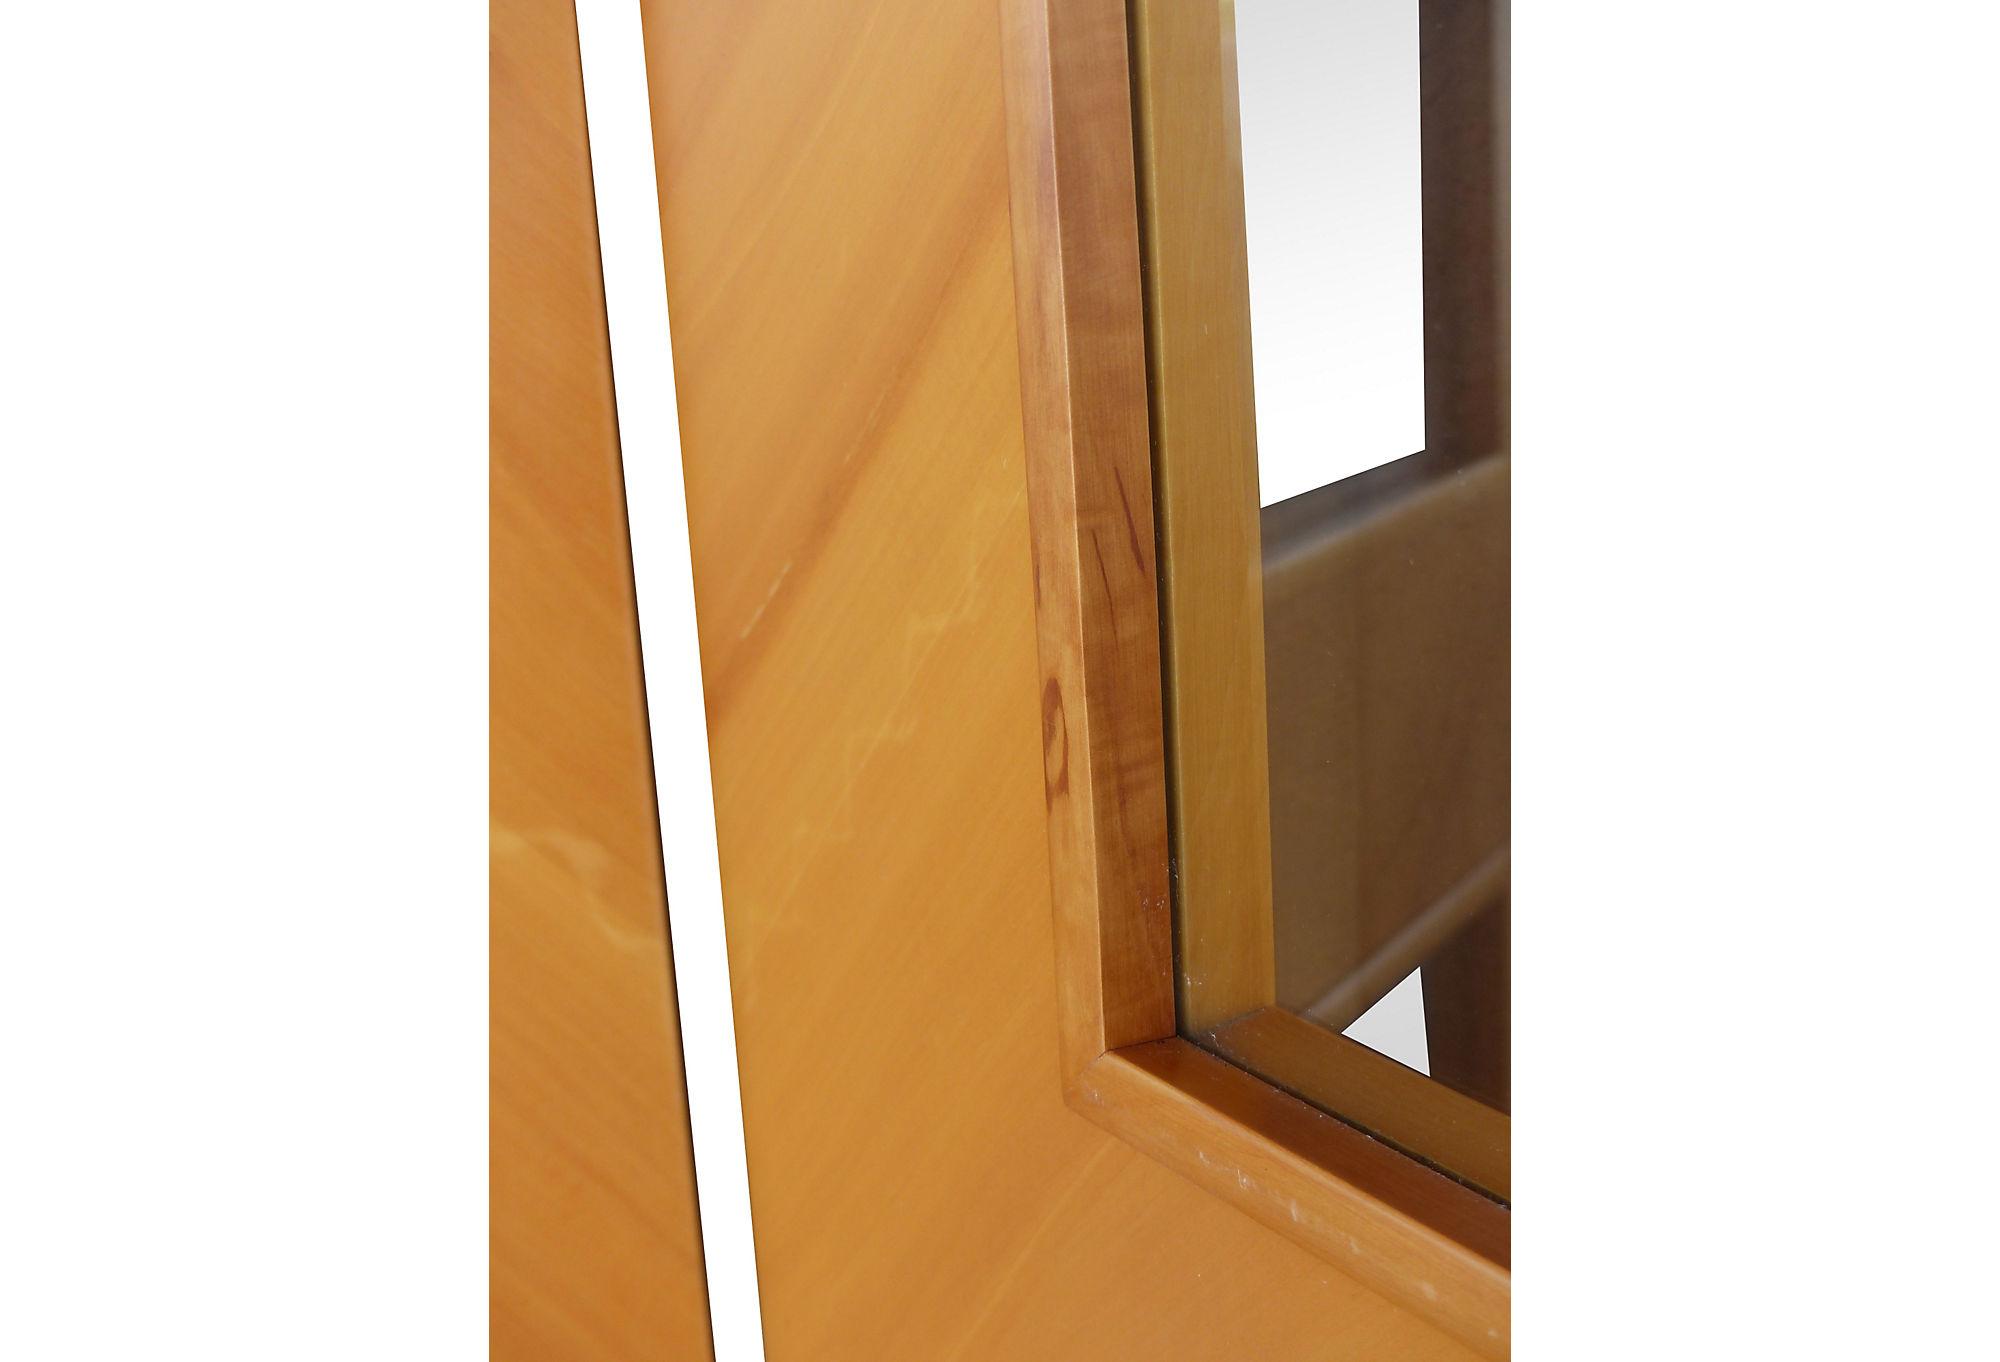 le paravent de l 39 autre screen by philippe starck for driade modernism. Black Bedroom Furniture Sets. Home Design Ideas